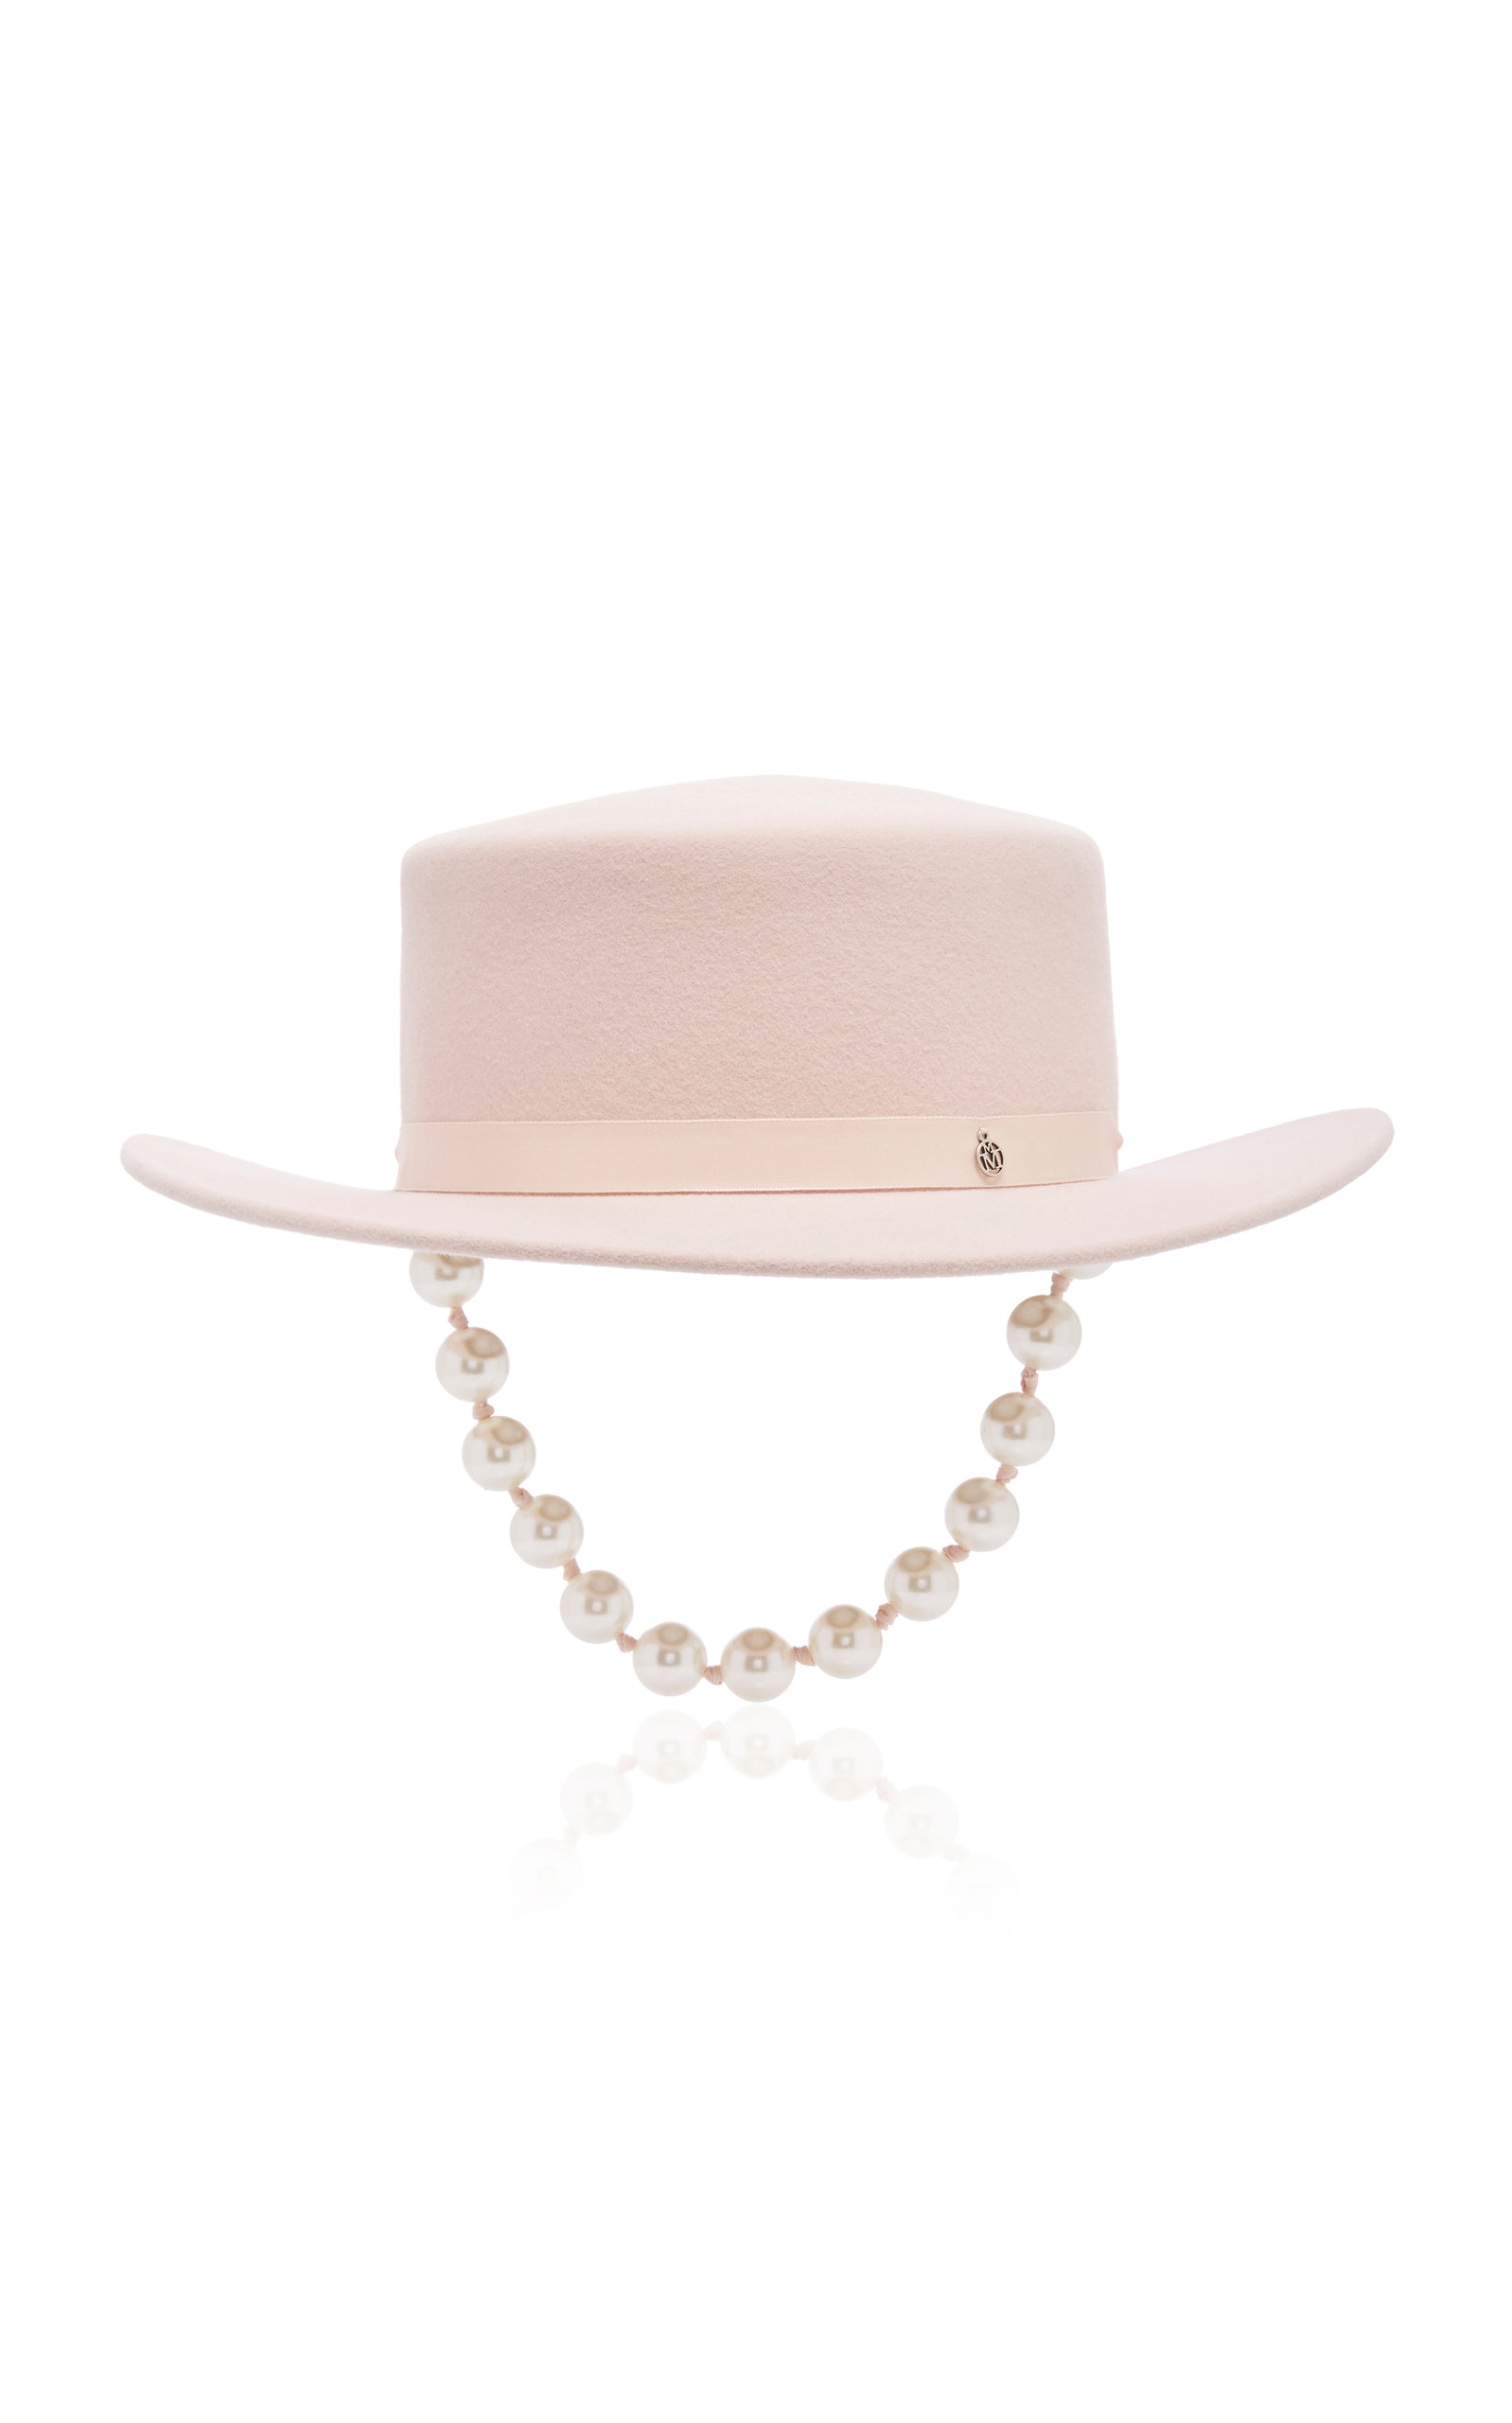 Maison Michel Hats Kiki Gangsta Pearl Embellished Felt Hat